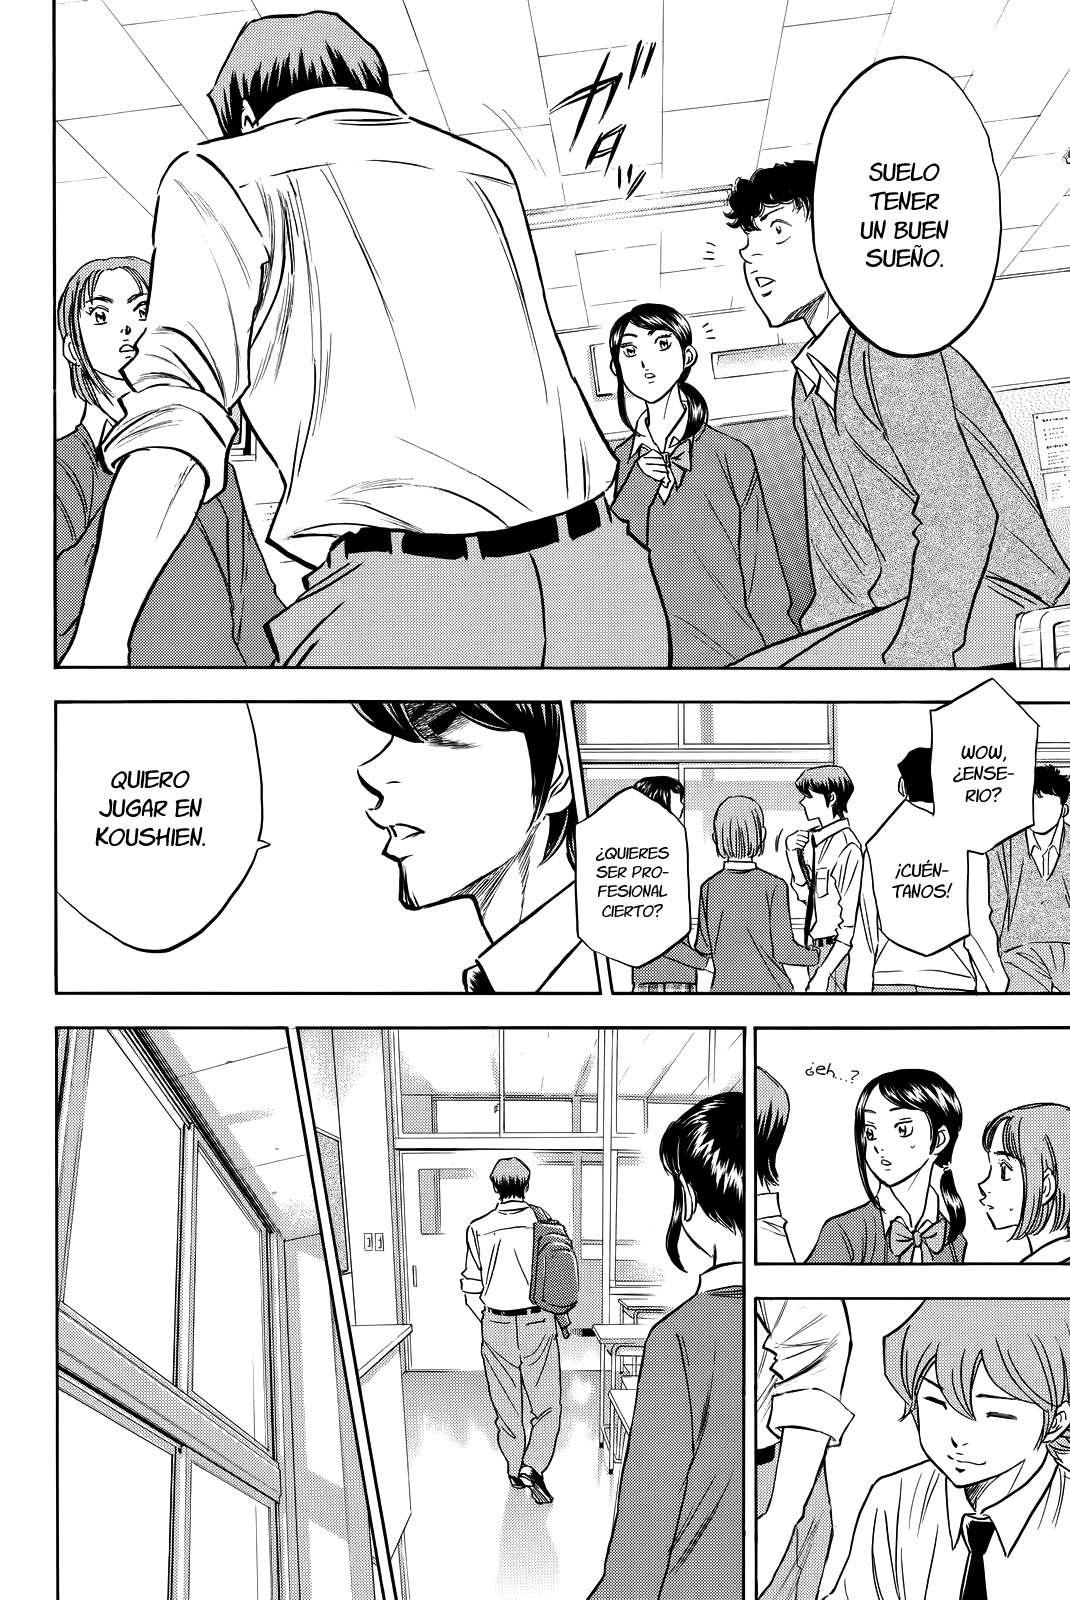 http://c5.ninemanga.com/es_manga/24/1752/416097/1c1ba9ba80151572f9ac1d731fc77bdf.jpg Page 9